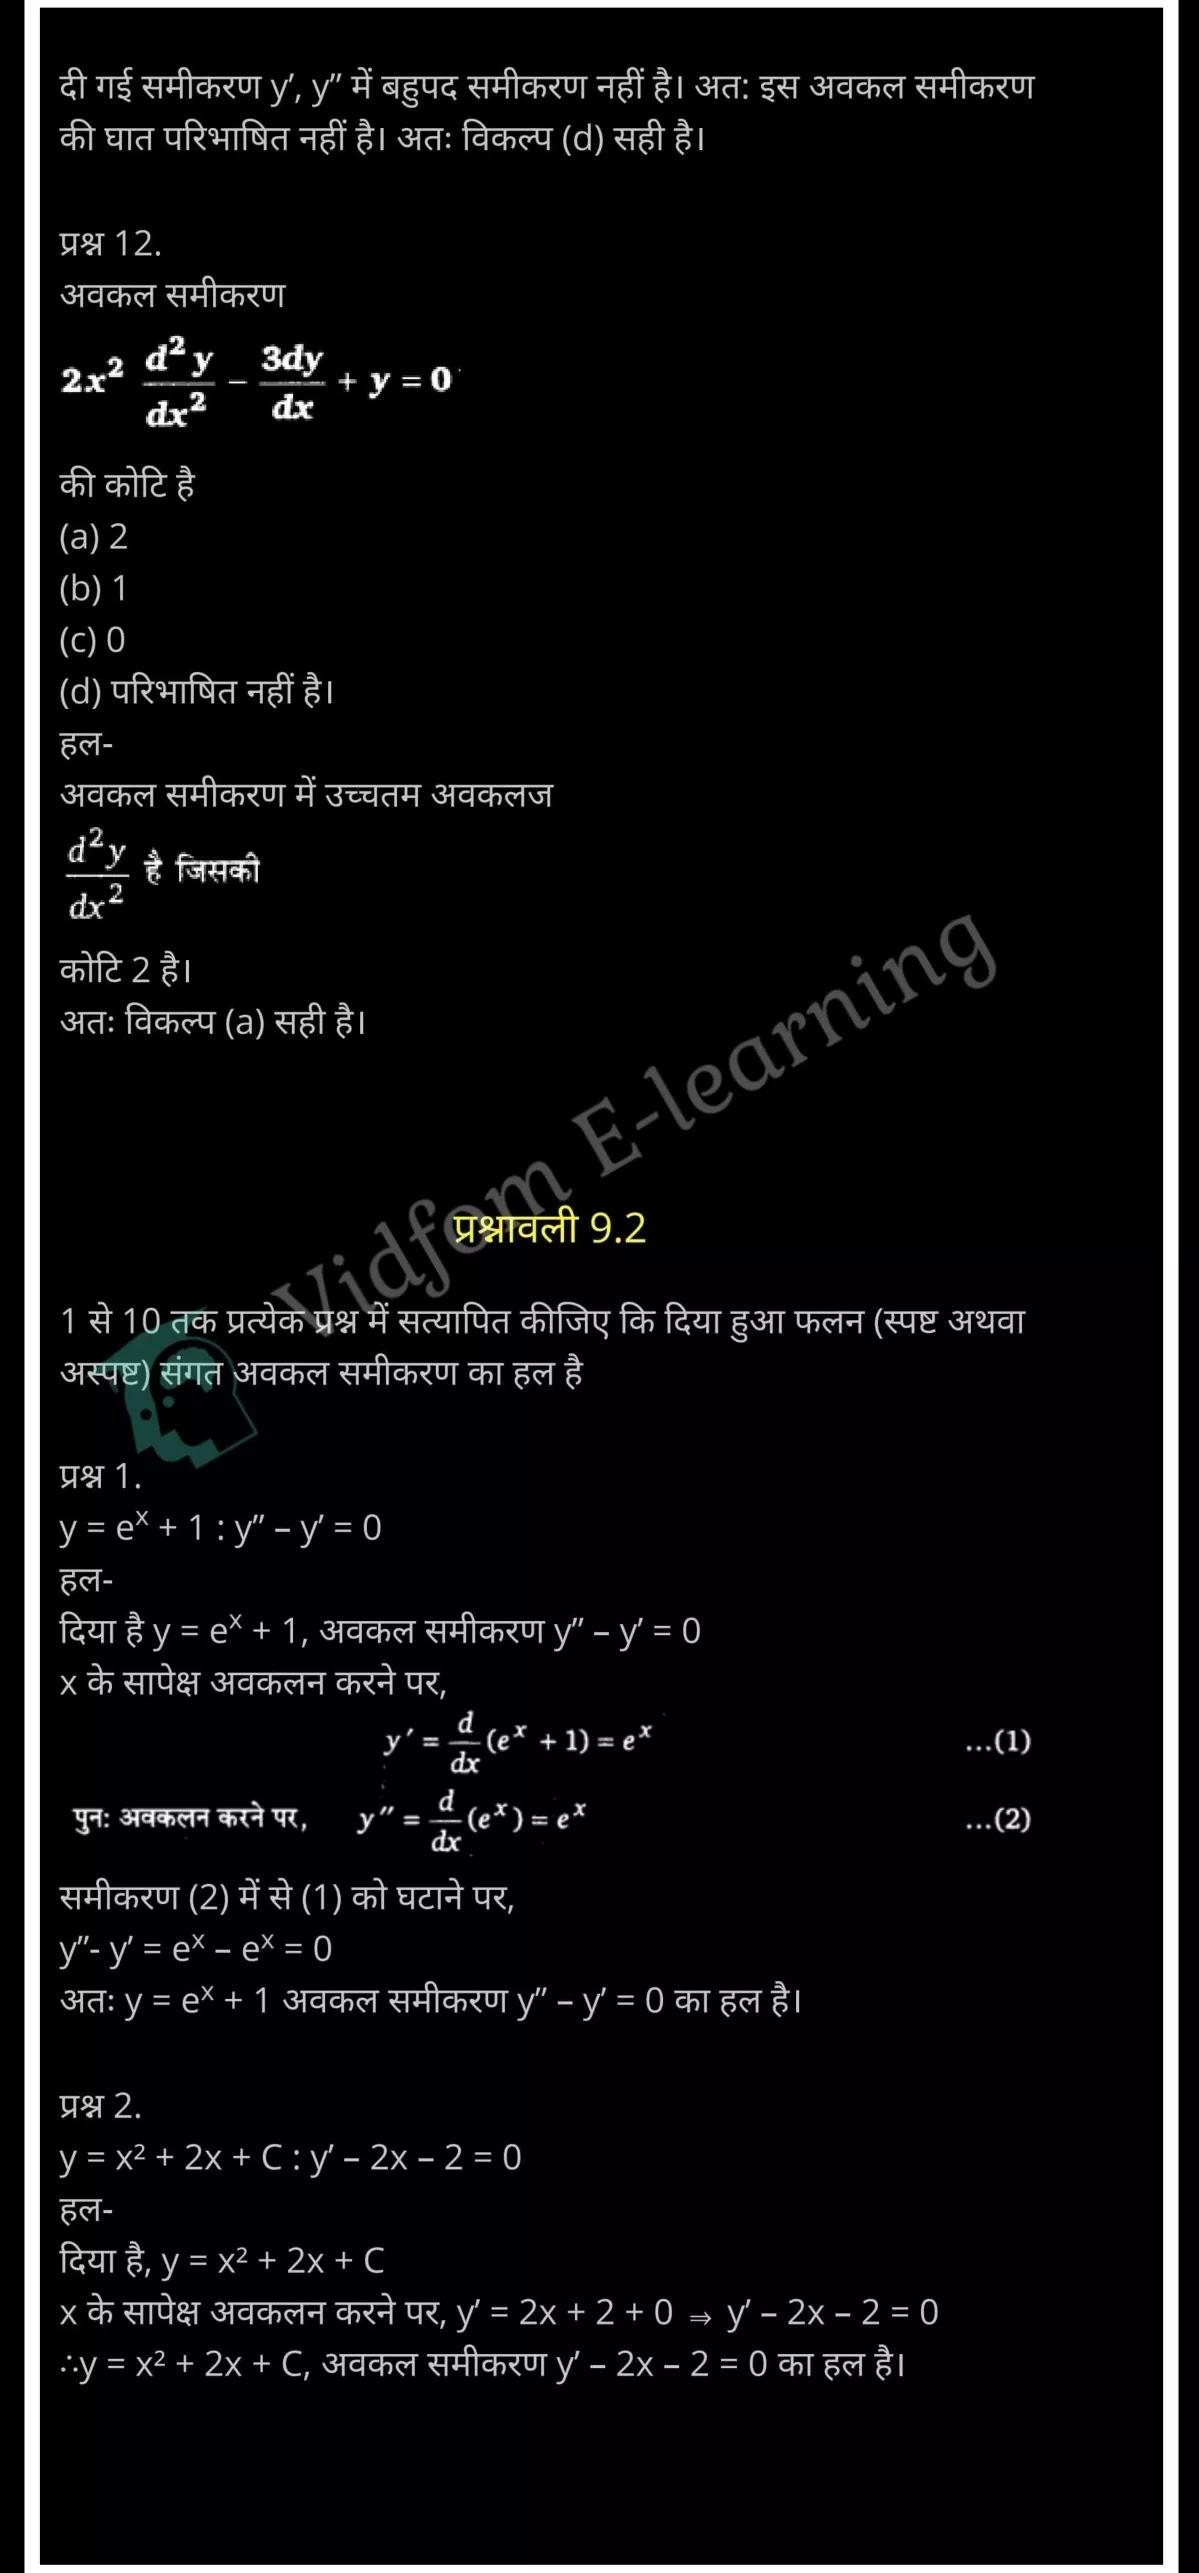 कक्षा 12 गणित  के नोट्स  हिंदी में एनसीईआरटी समाधान,     class 12 Maths Chapter 9,   class 12 Maths Chapter 9 ncert solutions in Hindi,   class 12 Maths Chapter 9 notes in hindi,   class 12 Maths Chapter 9 question answer,   class 12 Maths Chapter 9 notes,   class 12 Maths Chapter 9 class 12 Maths Chapter 9 in  hindi,    class 12 Maths Chapter 9 important questions in  hindi,   class 12 Maths Chapter 9 notes in hindi,    class 12 Maths Chapter 9 test,   class 12 Maths Chapter 9 pdf,   class 12 Maths Chapter 9 notes pdf,   class 12 Maths Chapter 9 exercise solutions,   class 12 Maths Chapter 9 notes study rankers,   class 12 Maths Chapter 9 notes,    class 12 Maths Chapter 9  class 12  notes pdf,   class 12 Maths Chapter 9 class 12  notes  ncert,   class 12 Maths Chapter 9 class 12 pdf,   class 12 Maths Chapter 9  book,   class 12 Maths Chapter 9 quiz class 12  ,    10  th class 12 Maths Chapter 9  book up board,   up board 10  th class 12 Maths Chapter 9 notes,  class 12 Maths,   class 12 Maths ncert solutions in Hindi,   class 12 Maths notes in hindi,   class 12 Maths question answer,   class 12 Maths notes,  class 12 Maths class 12 Maths Chapter 9 in  hindi,    class 12 Maths important questions in  hindi,   class 12 Maths notes in hindi,    class 12 Maths test,  class 12 Maths class 12 Maths Chapter 9 pdf,   class 12 Maths notes pdf,   class 12 Maths exercise solutions,   class 12 Maths,  class 12 Maths notes study rankers,   class 12 Maths notes,  class 12 Maths notes,   class 12 Maths  class 12  notes pdf,   class 12 Maths class 12  notes  ncert,   class 12 Maths class 12 pdf,   class 12 Maths  book,  class 12 Maths quiz class 12  ,  10  th class 12 Maths    book up board,    up board 10  th class 12 Maths notes,      कक्षा 12 गणित अध्याय 9 ,  कक्षा 12 गणित, कक्षा 12 गणित अध्याय 9  के नोट्स हिंदी में,  कक्षा 12 का हिंदी अध्याय 9 का प्रश्न उत्तर,  कक्षा 12 गणित अध्याय 9 के नोट्स,  10 कक्षा गणित  हिंदी में, कक्षा 12 गणित अध्याय 9  हिंदी में,  कक्षा 12 गणित अध्याय